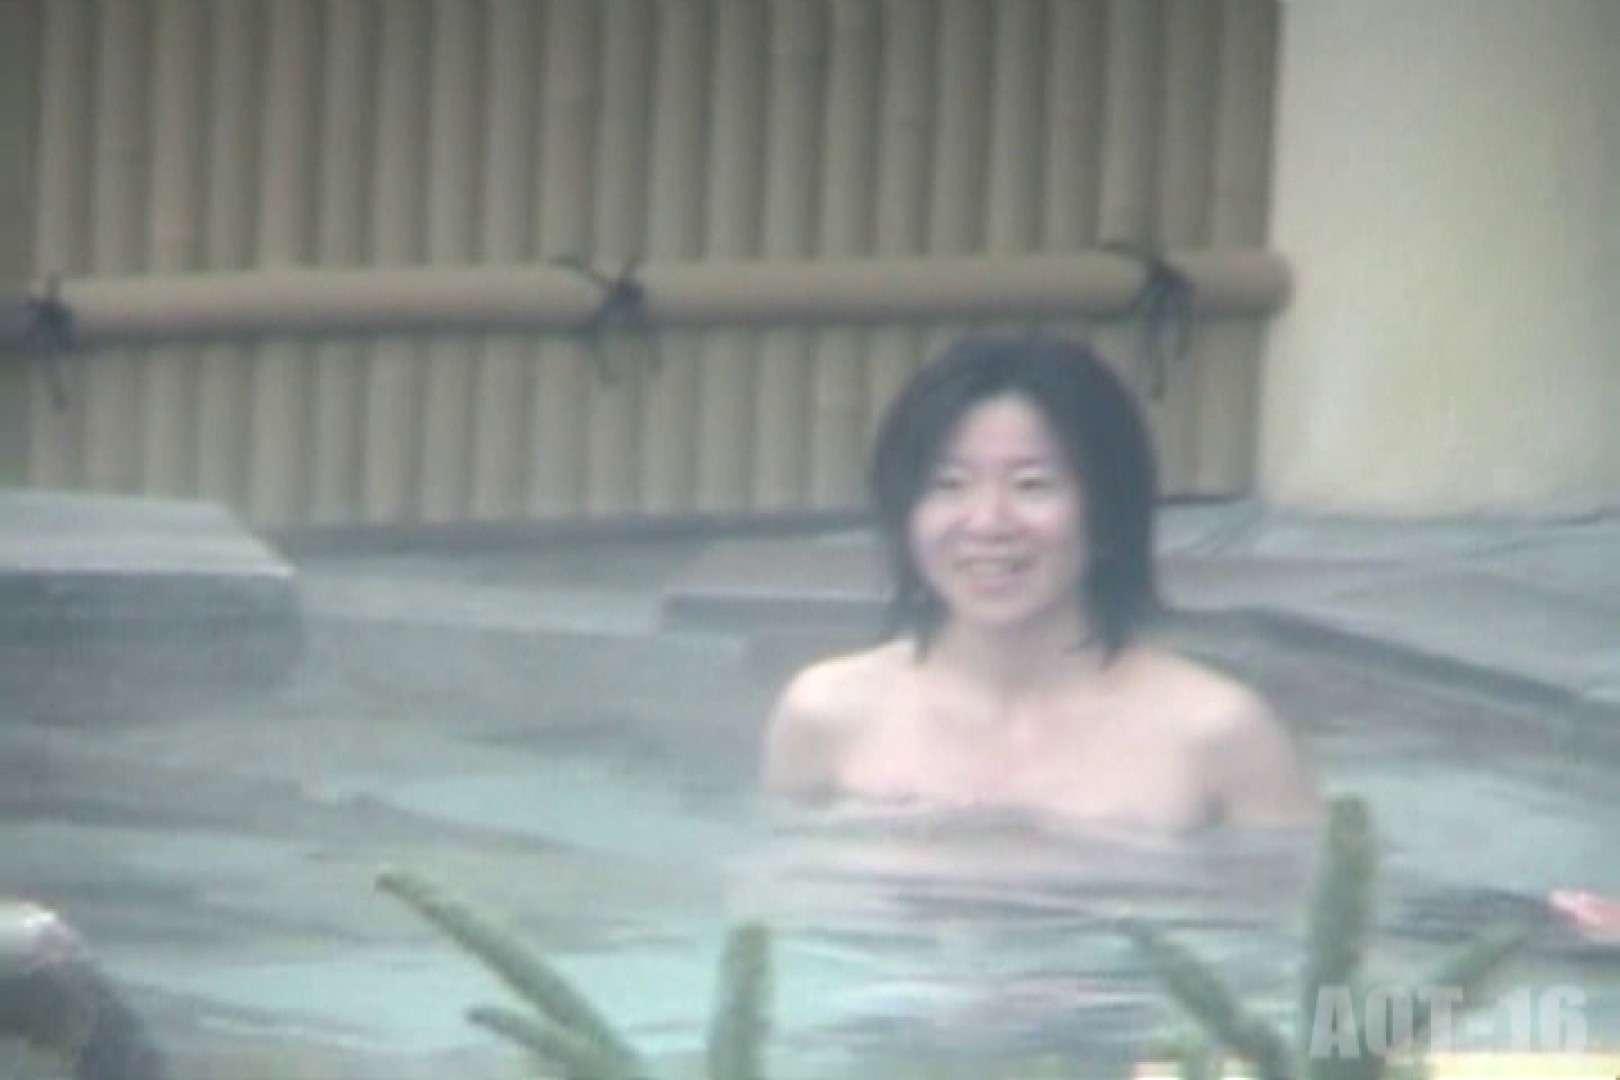 Aquaな露天風呂Vol.841 盗撮大放出 オメコ無修正動画無料 49連発 38